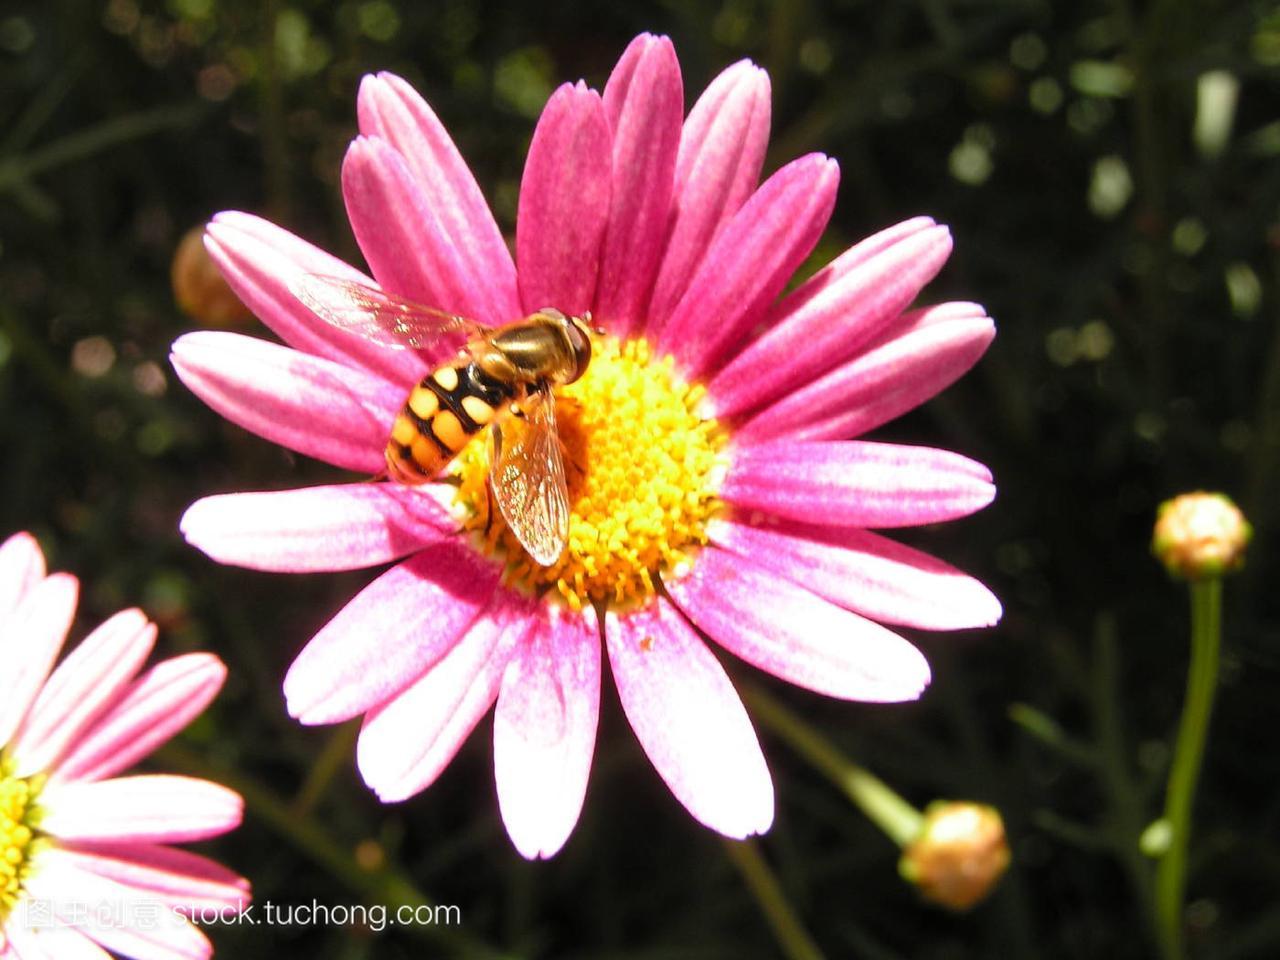 动物,animal,卡通,insect,昆虫,flower,花卉,plant,脑袋像下的狮子植物图图片